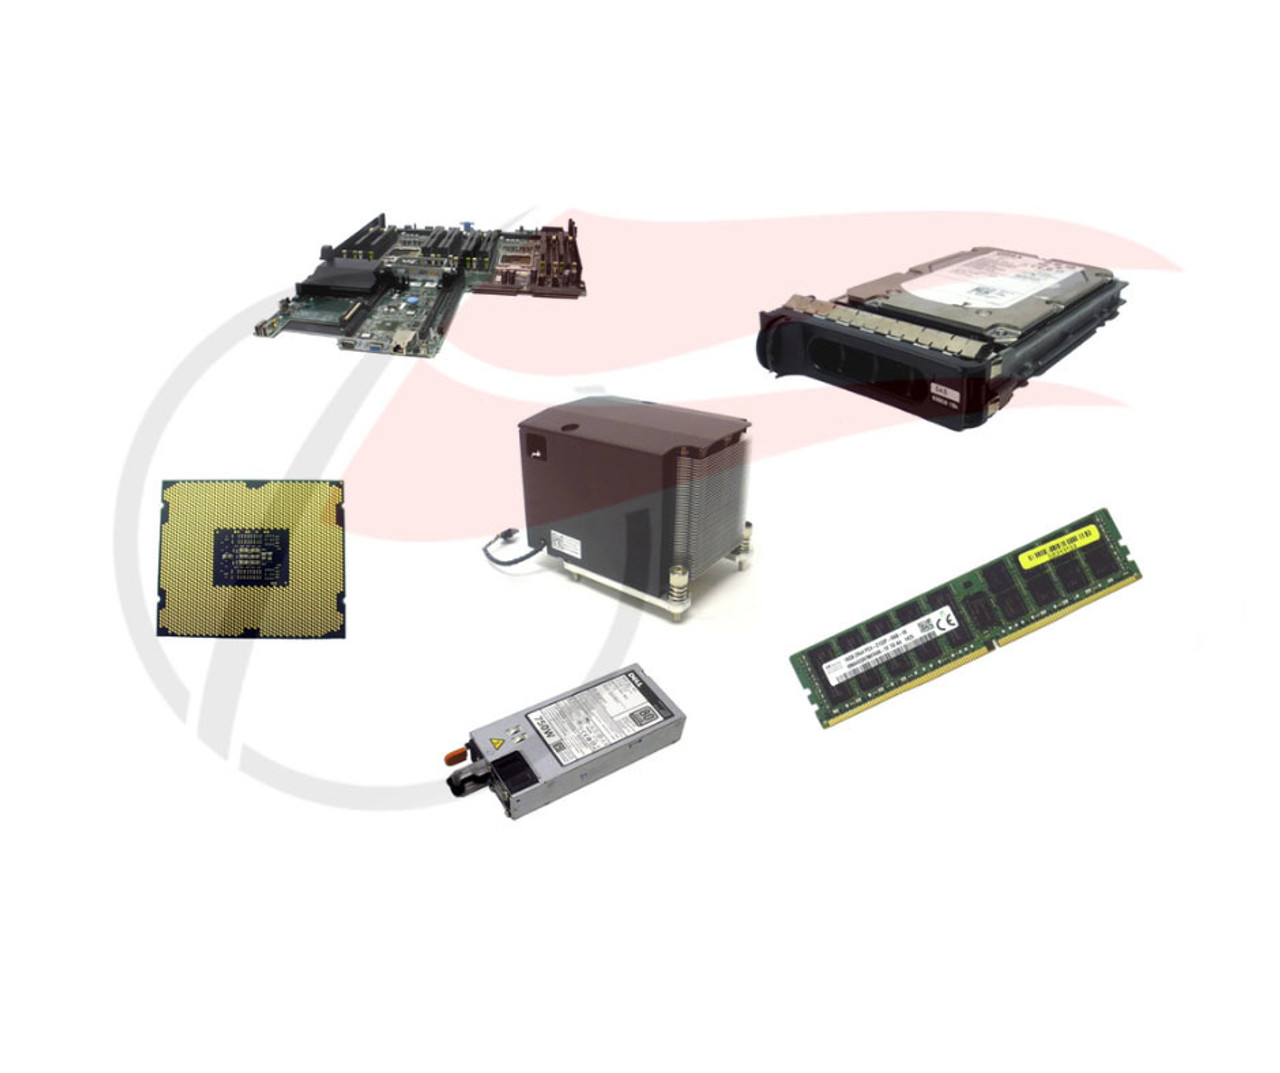 Dell PowerEdge R720 Media Readers